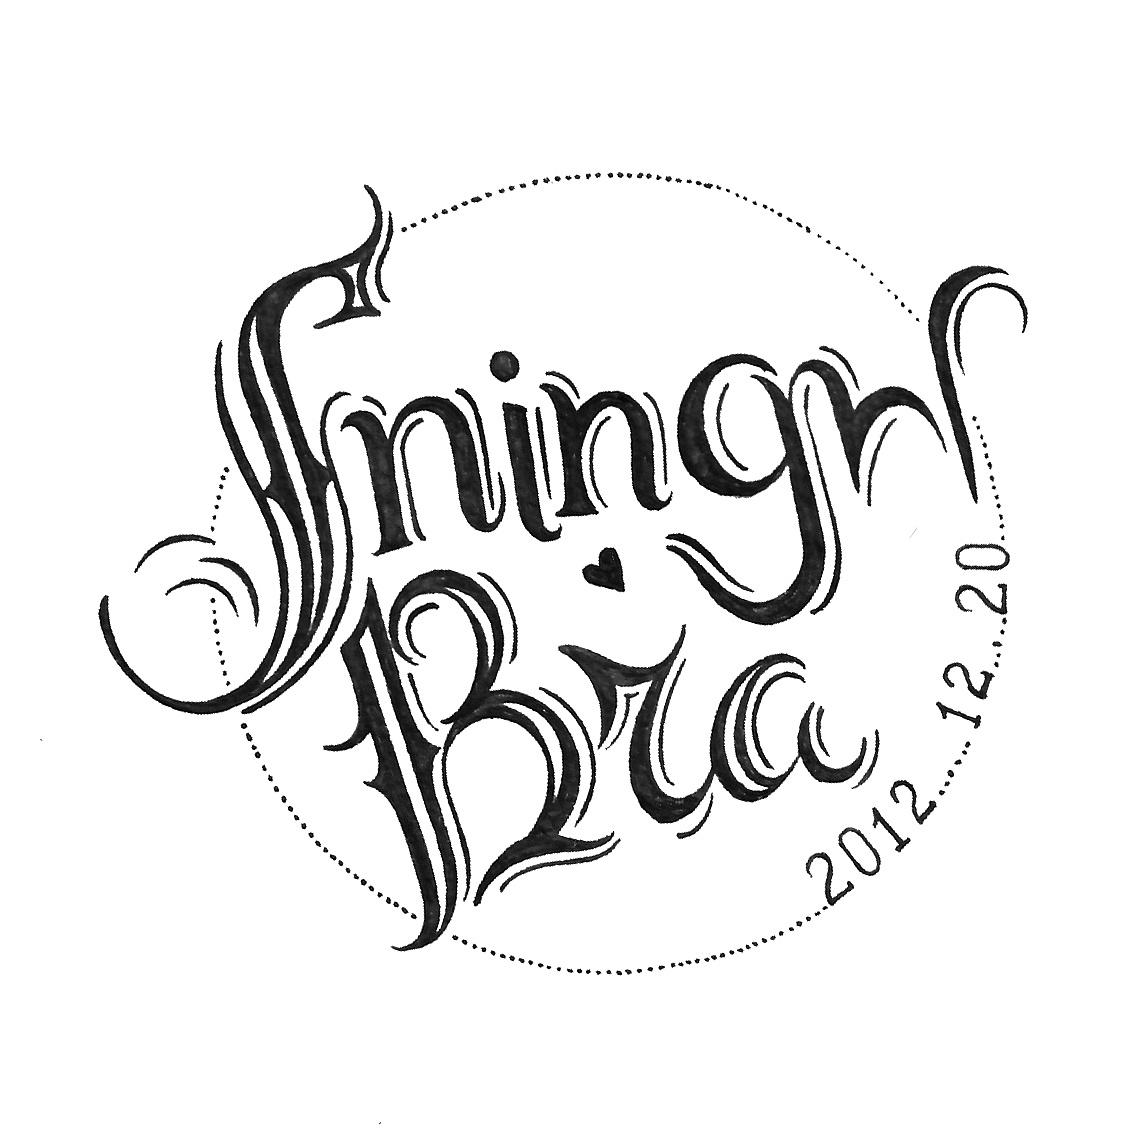 sningwbra给一对大全v大全公司室内设计纹身取名字情侣图片